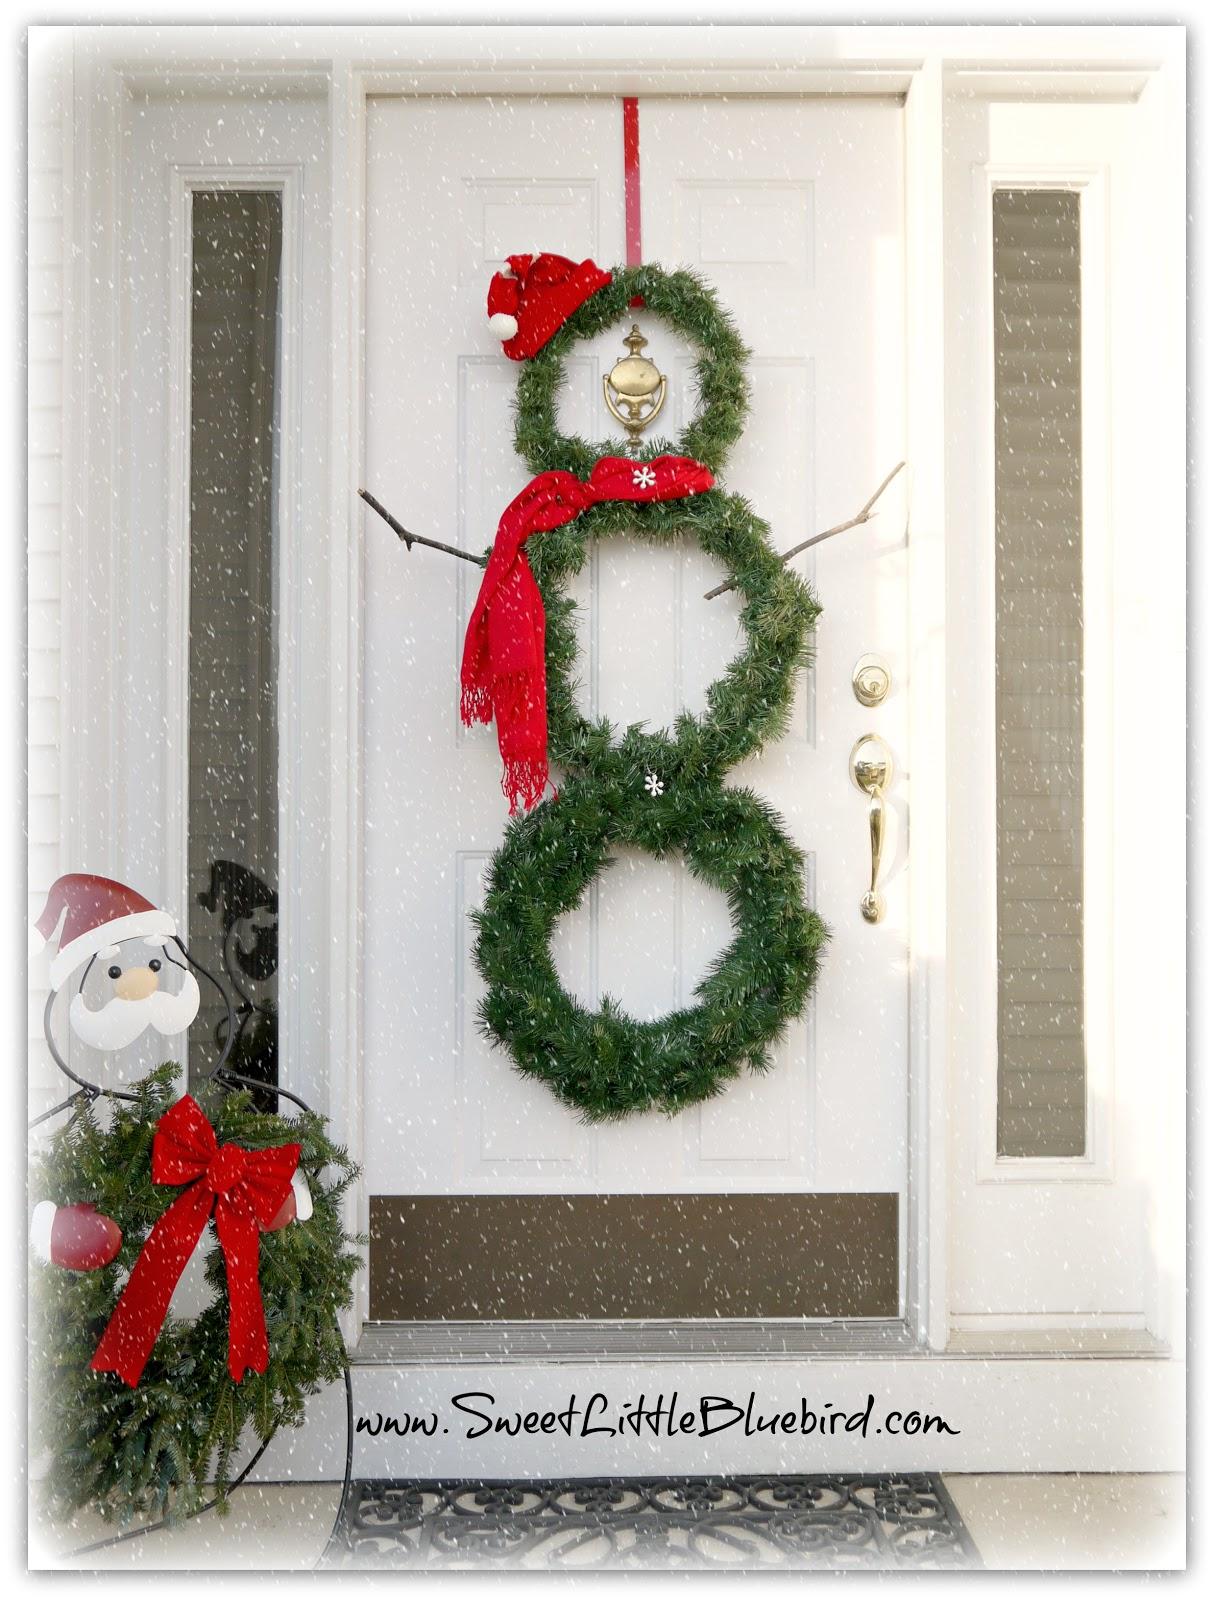 Diy snowman wreath sweet little bluebird - Decoracion de navidad para oficina ...